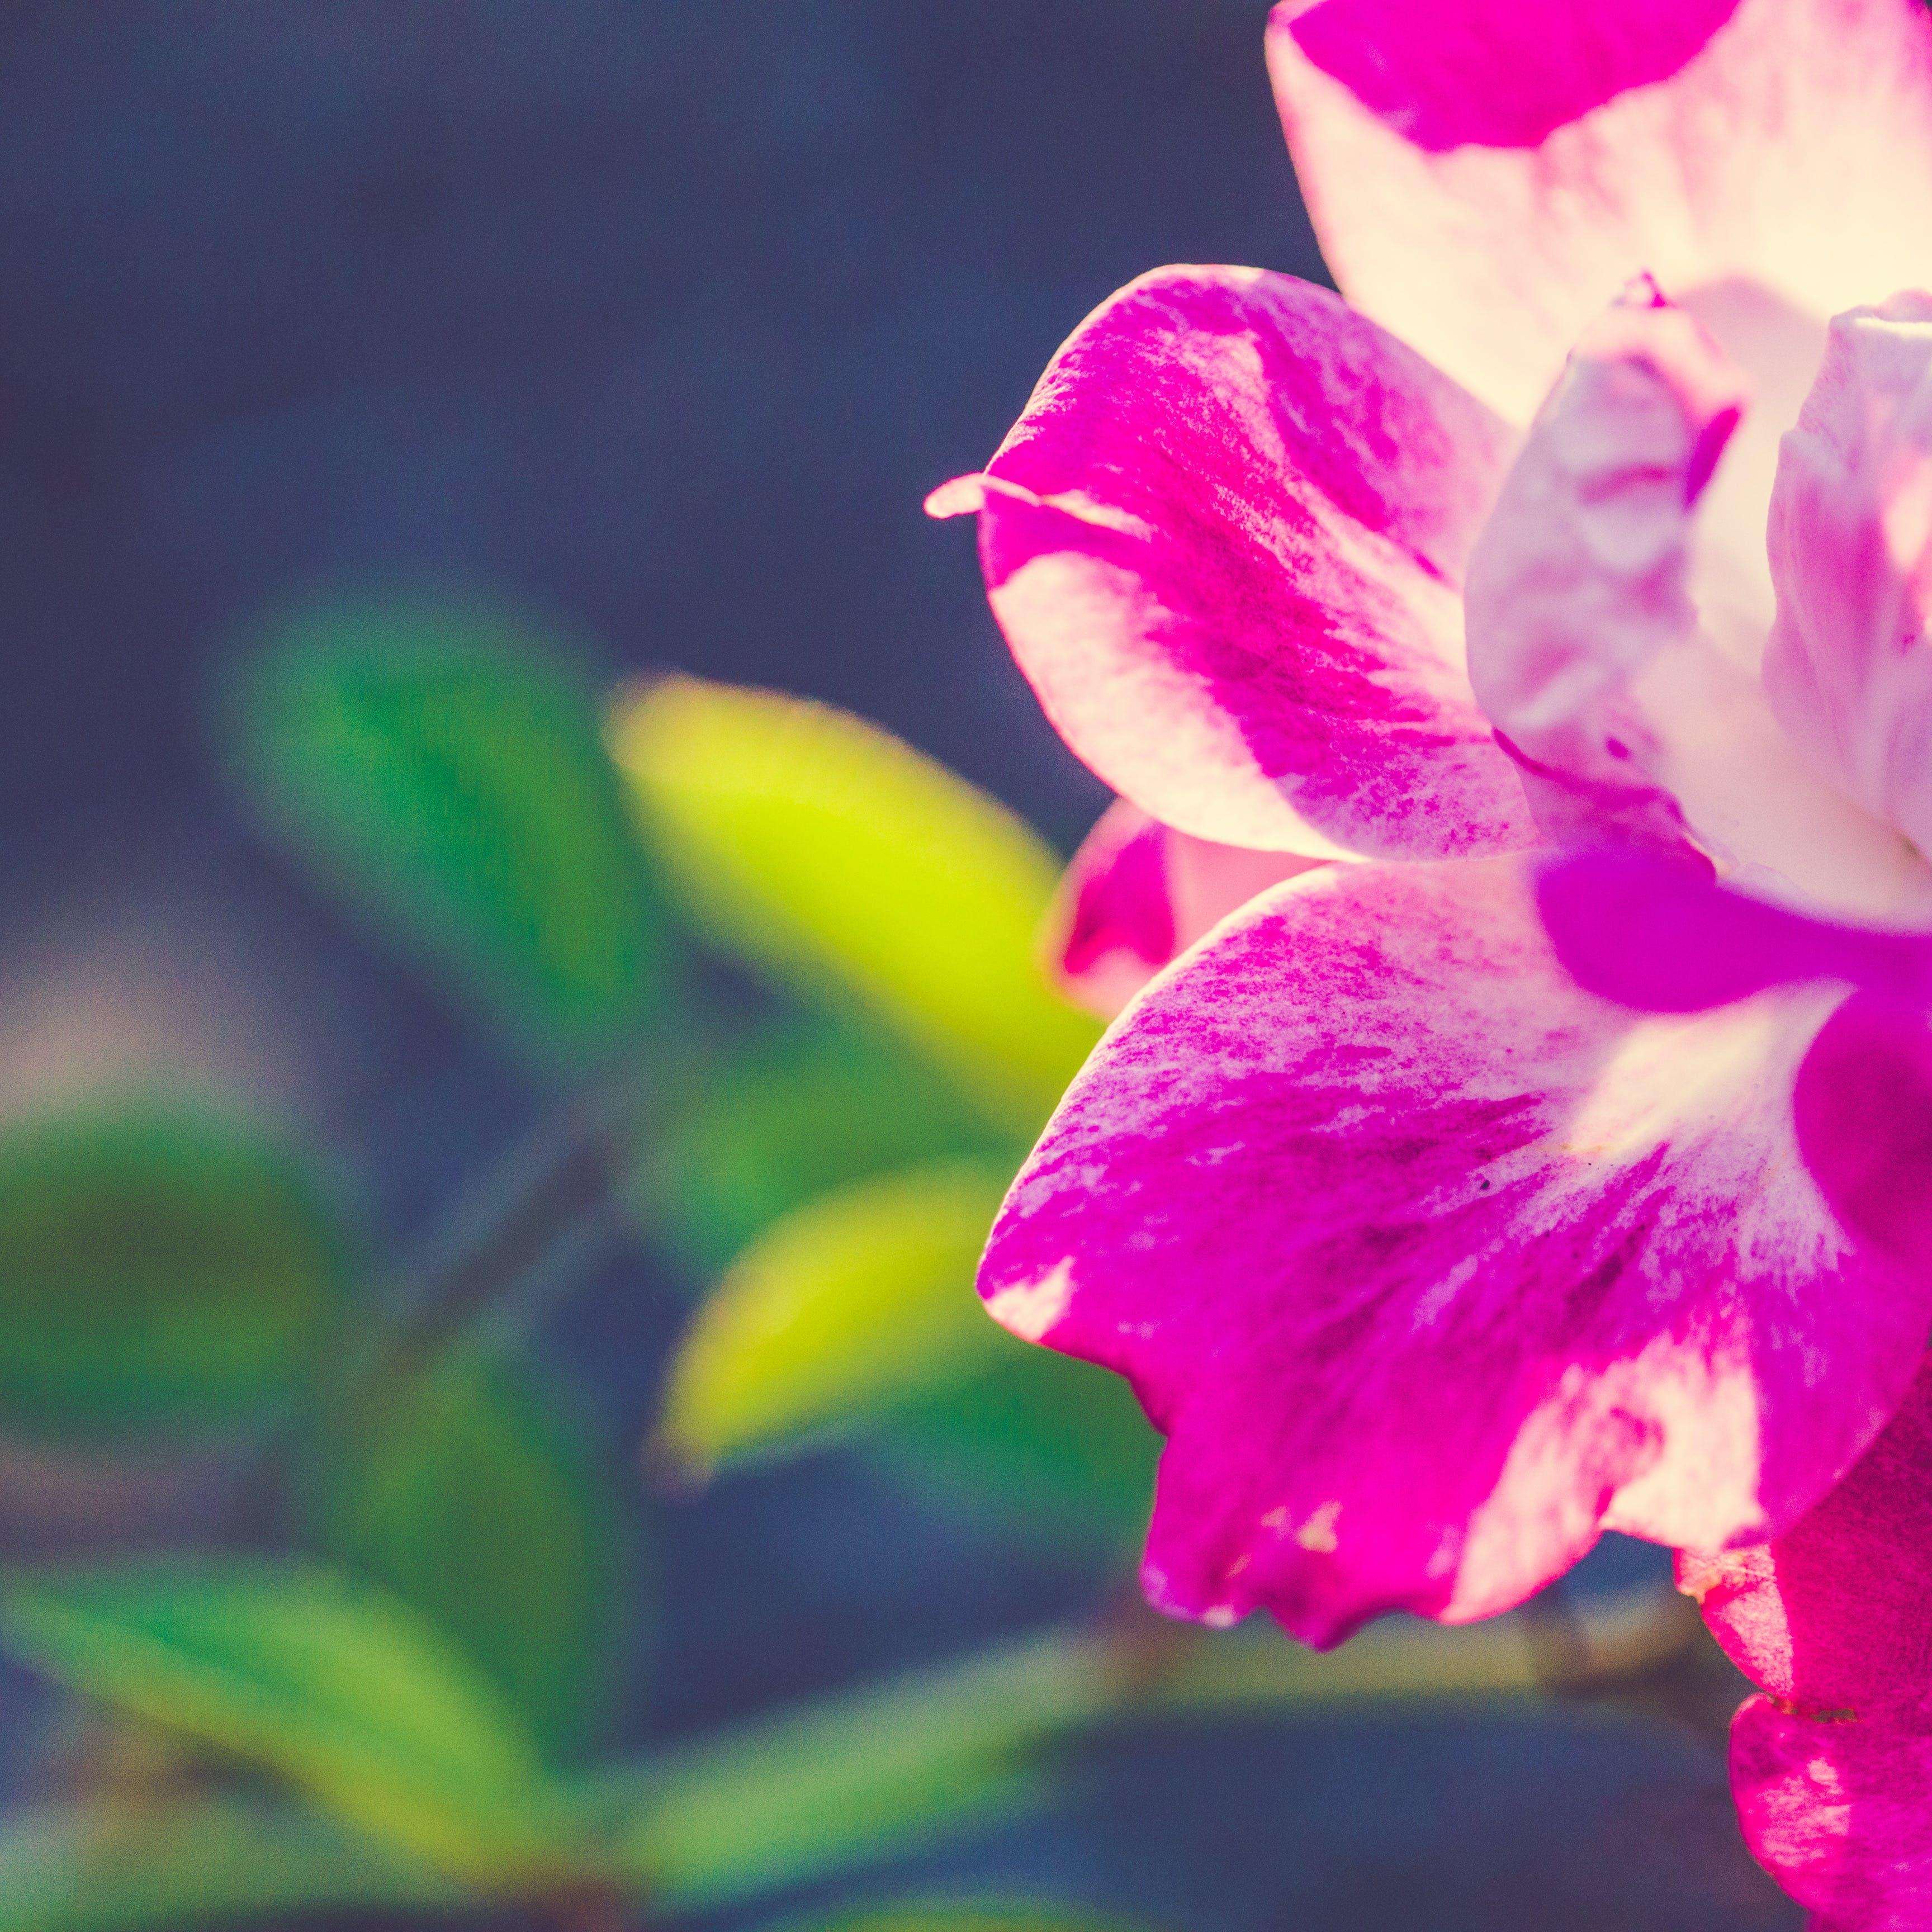 Kostenloses Stock Foto zu blume, makro, makrofotografie, natur